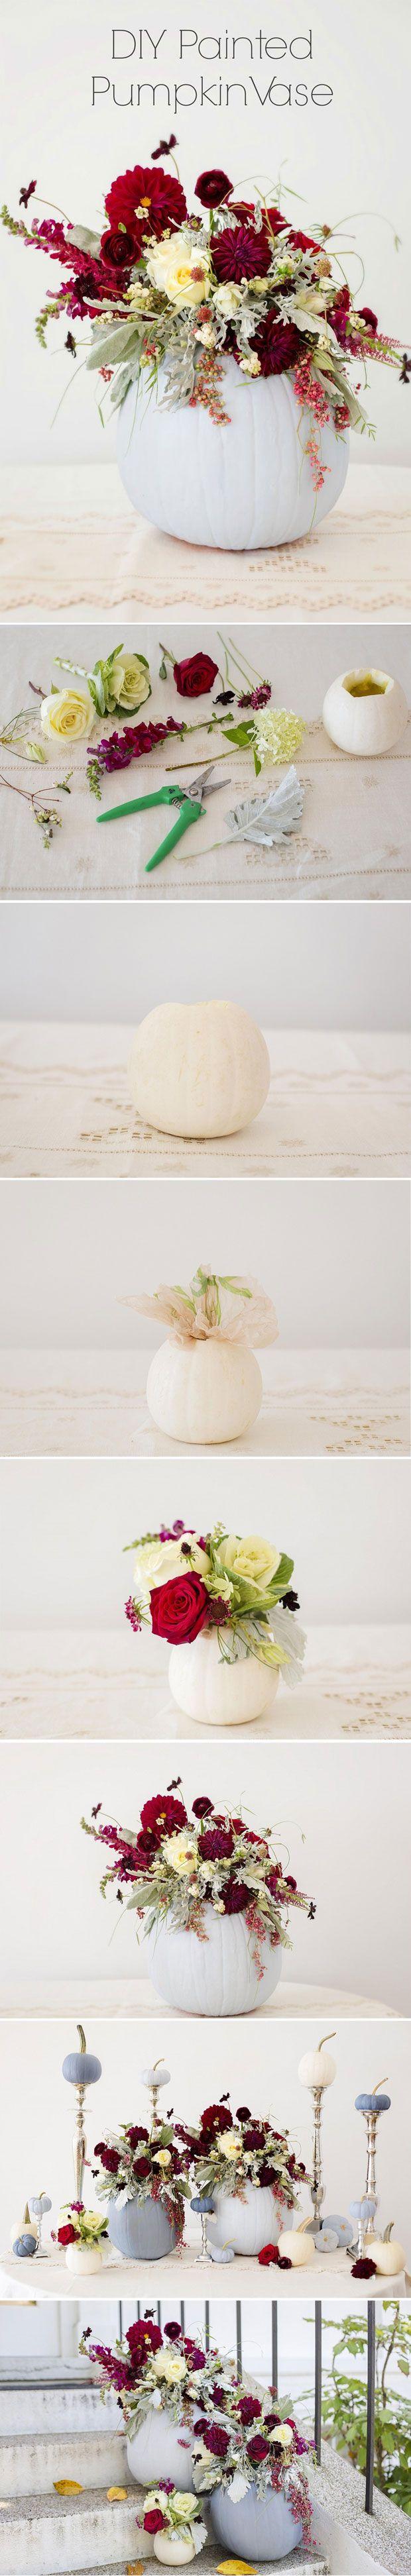 Diy halloween wedding decorations  DIY painted pumpkin wedding vases ideas for Halloween weddings